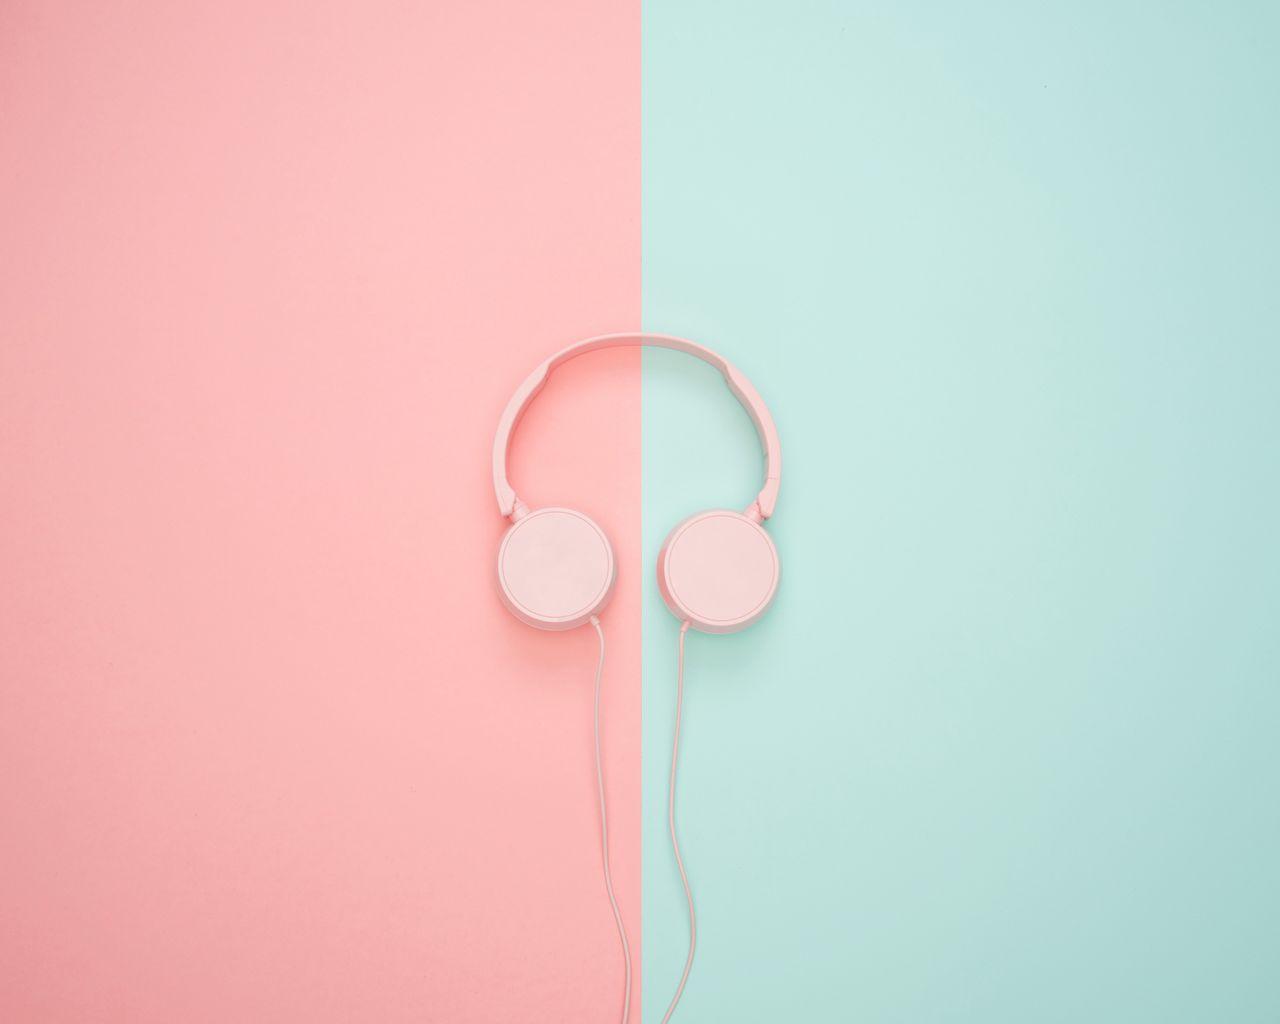 1280x1024 Wallpaper headphones, minimalism, pink, pastel